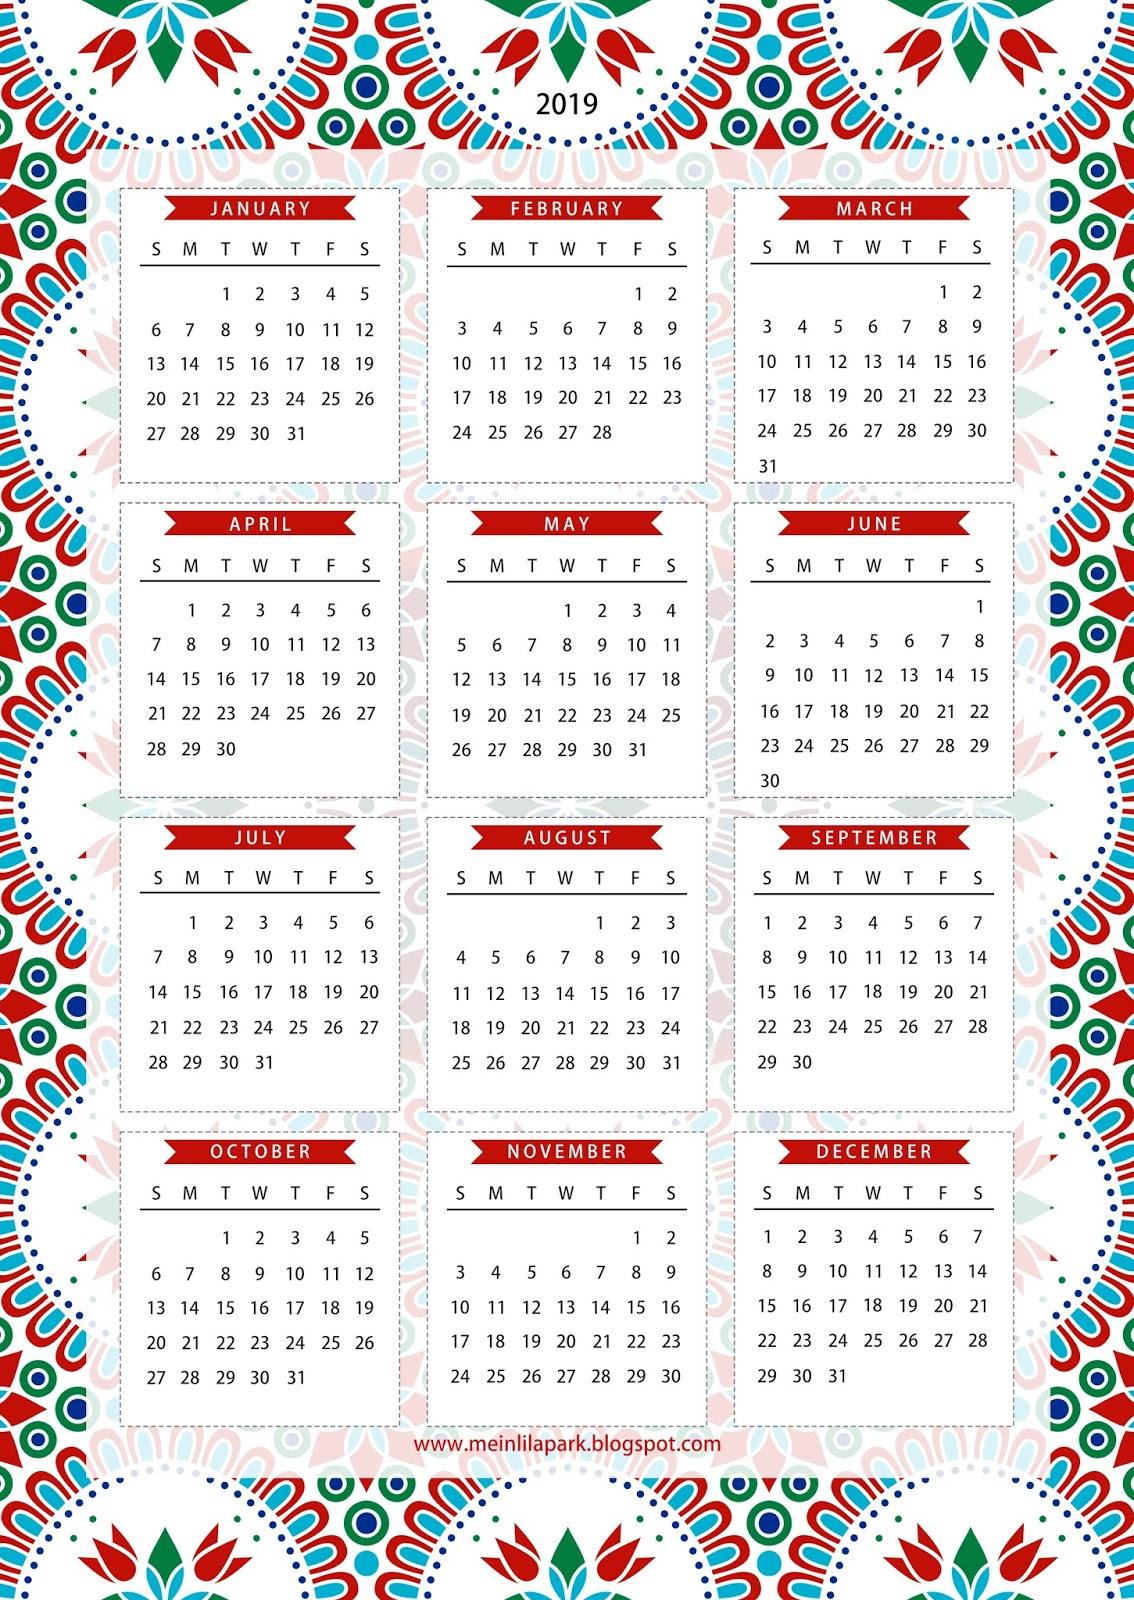 Free Printable 2019 One Page Calendar - Kalender - Freebie